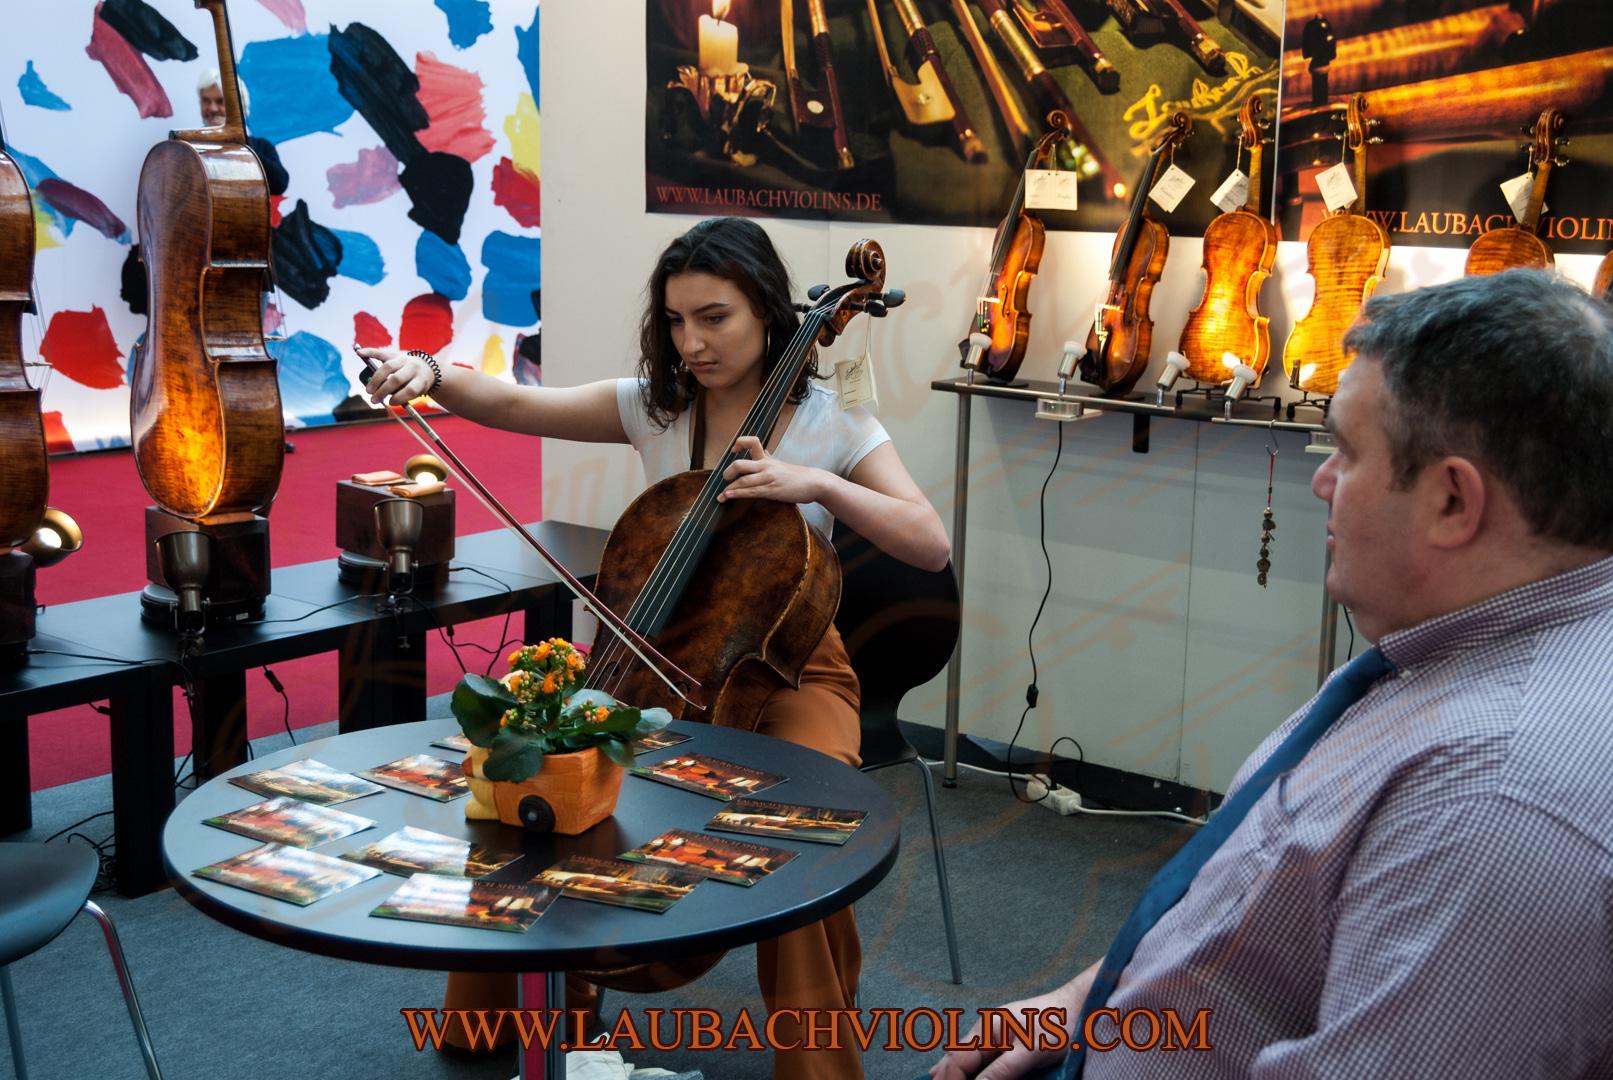 laubach_musikmesse_frankfurt_2017_8.jpg